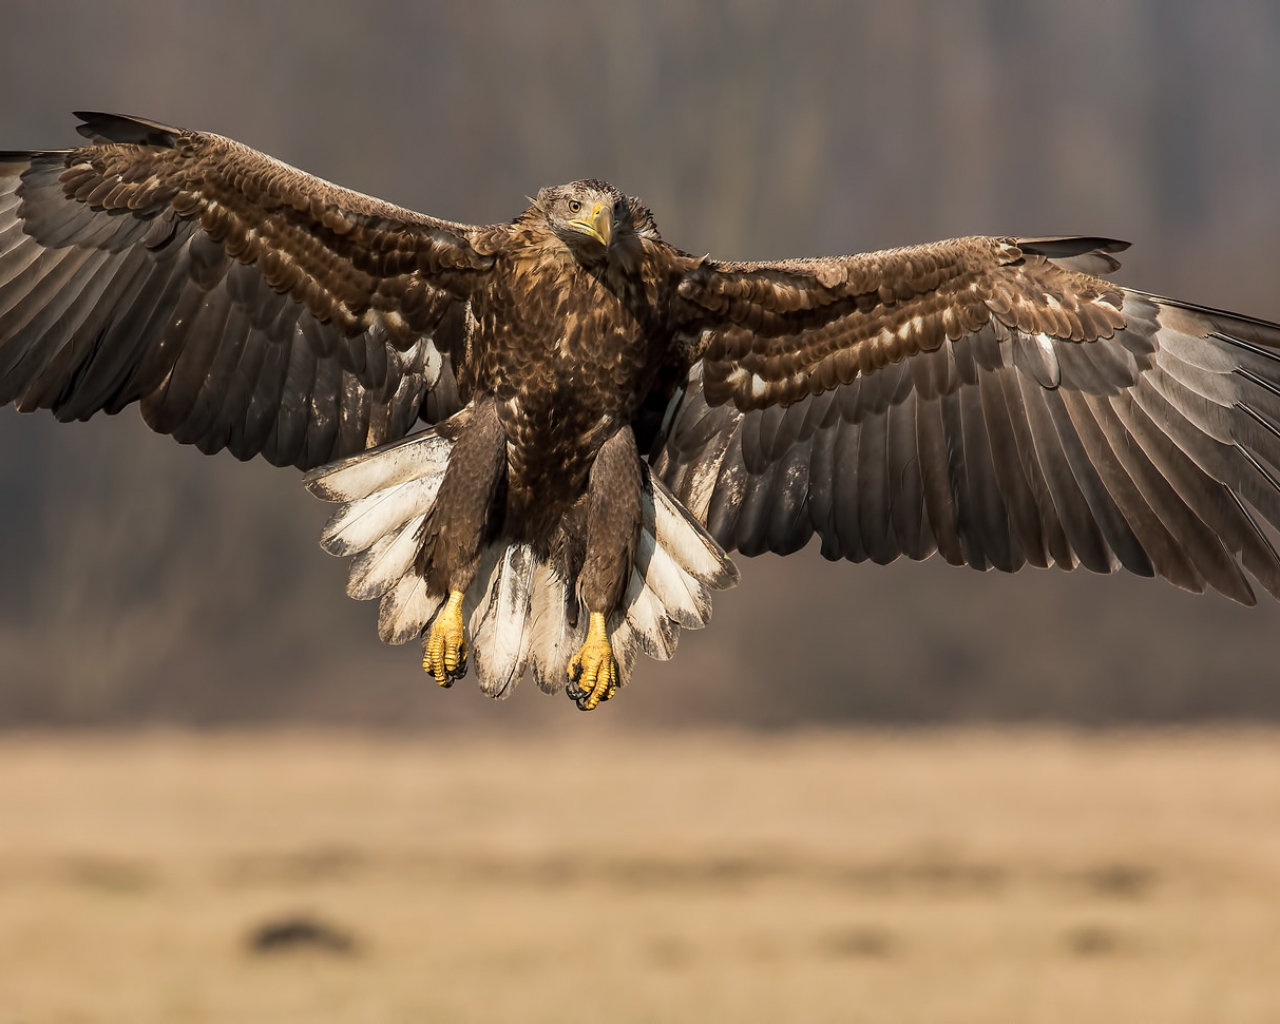 Un águila con las alas extendidas - 1280x1024